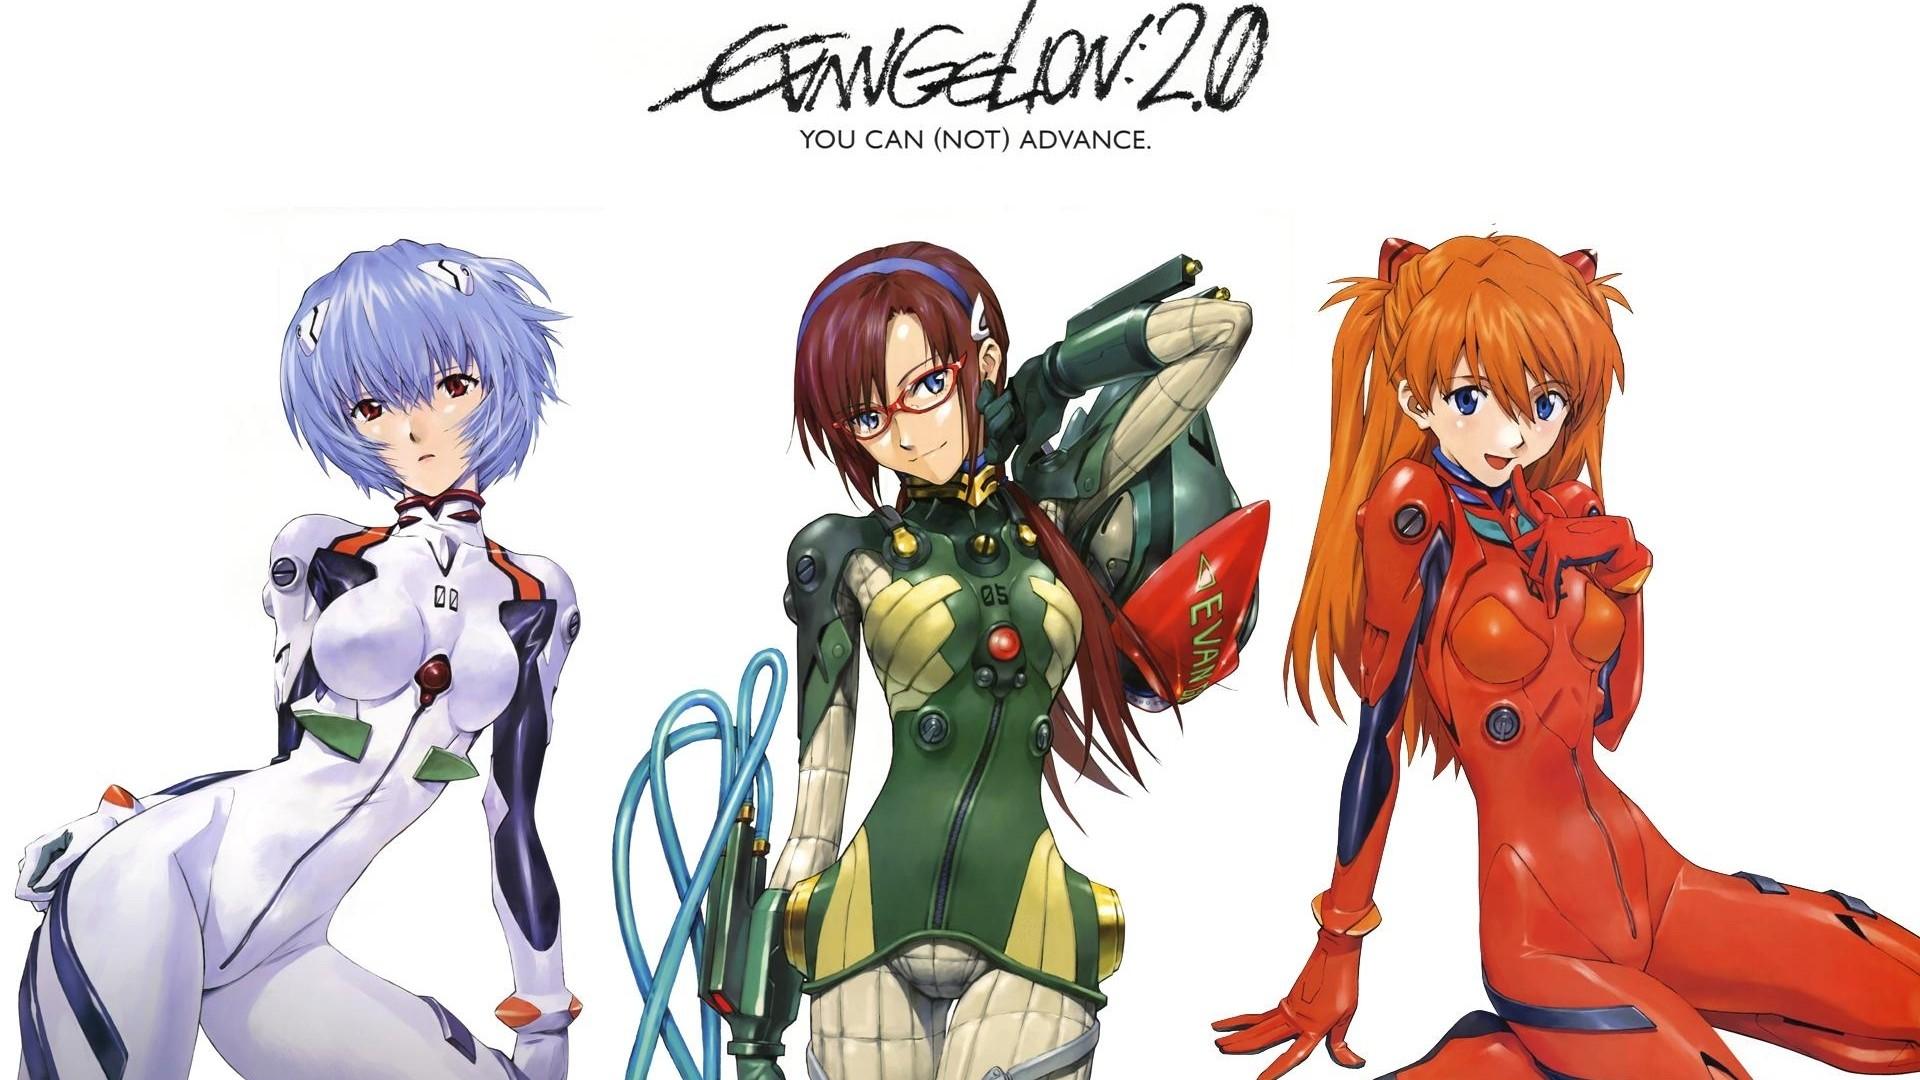 Neon Genesis Evangelion Asuka Langley Soryu Ayanami Rei Makinami Mari